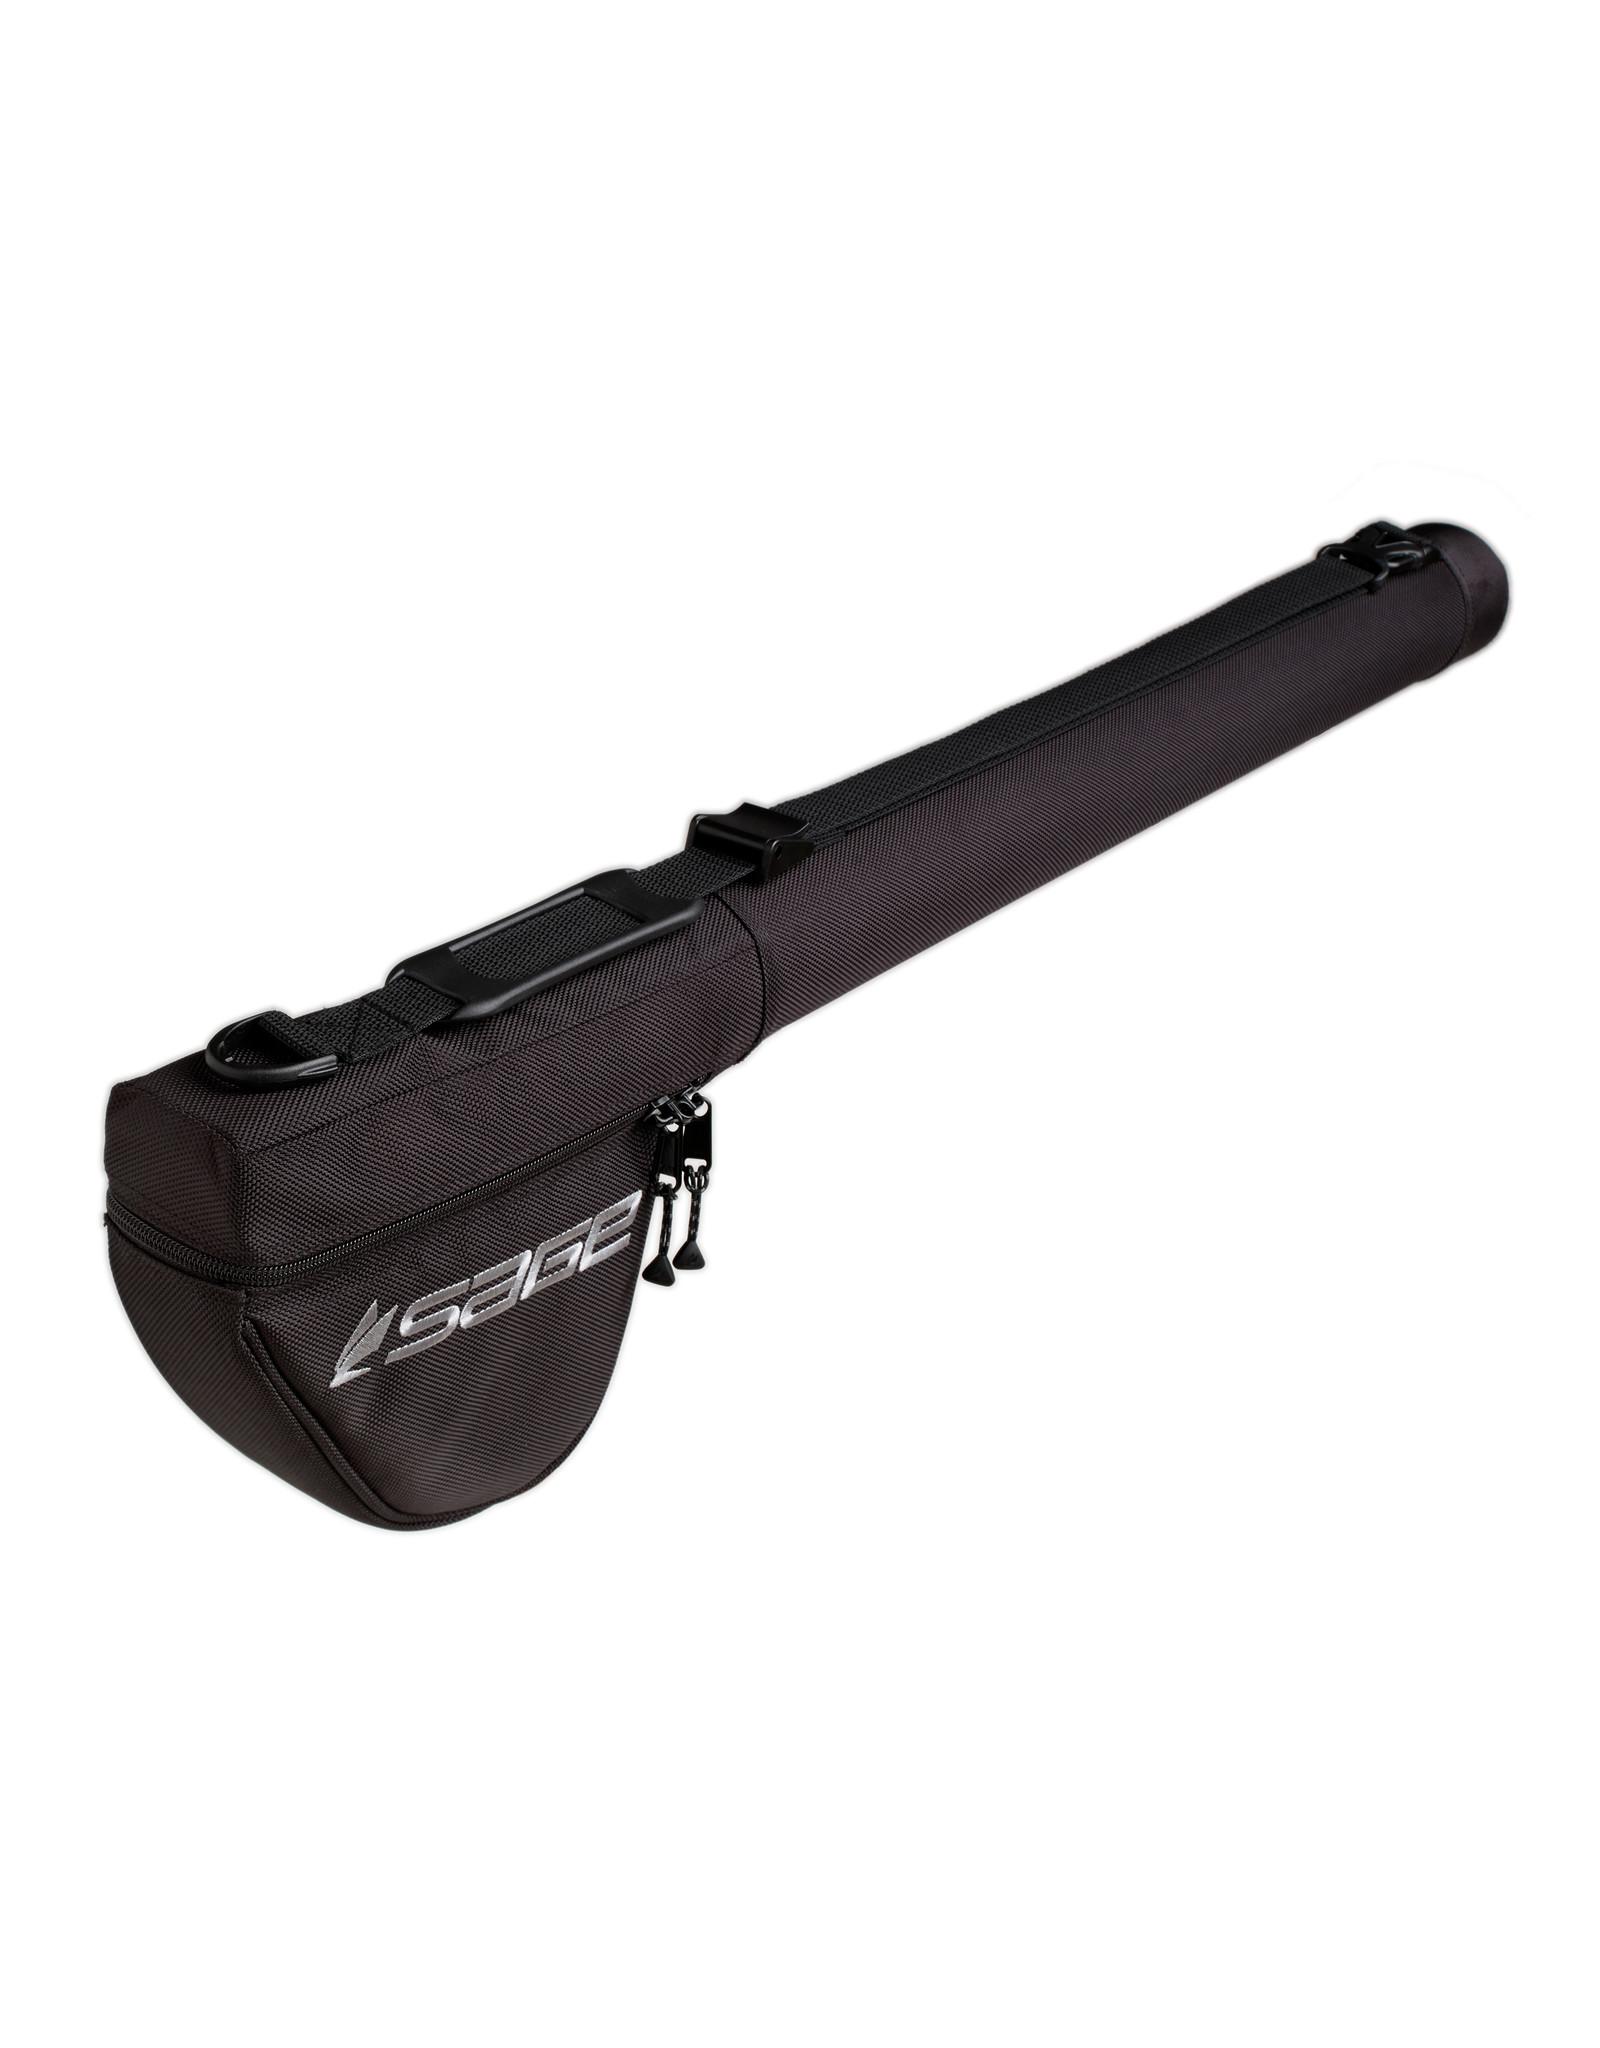 SAGE Ballistic Rod/Reel Case